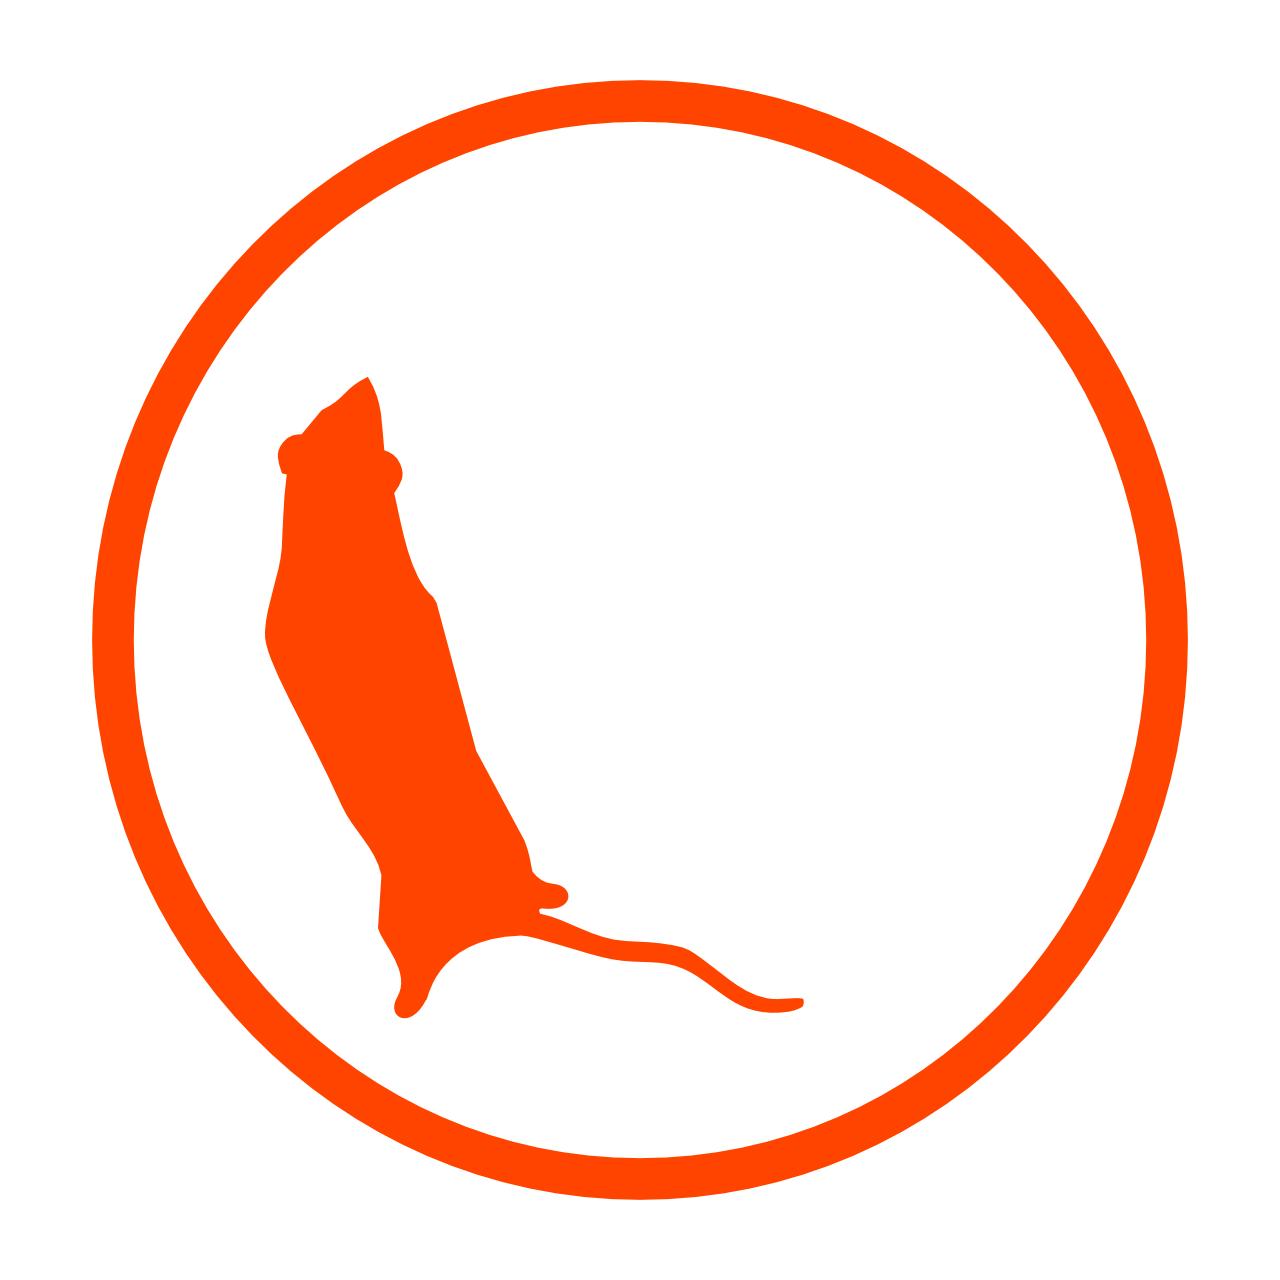 logos/deepOF_logo_wo_text.png